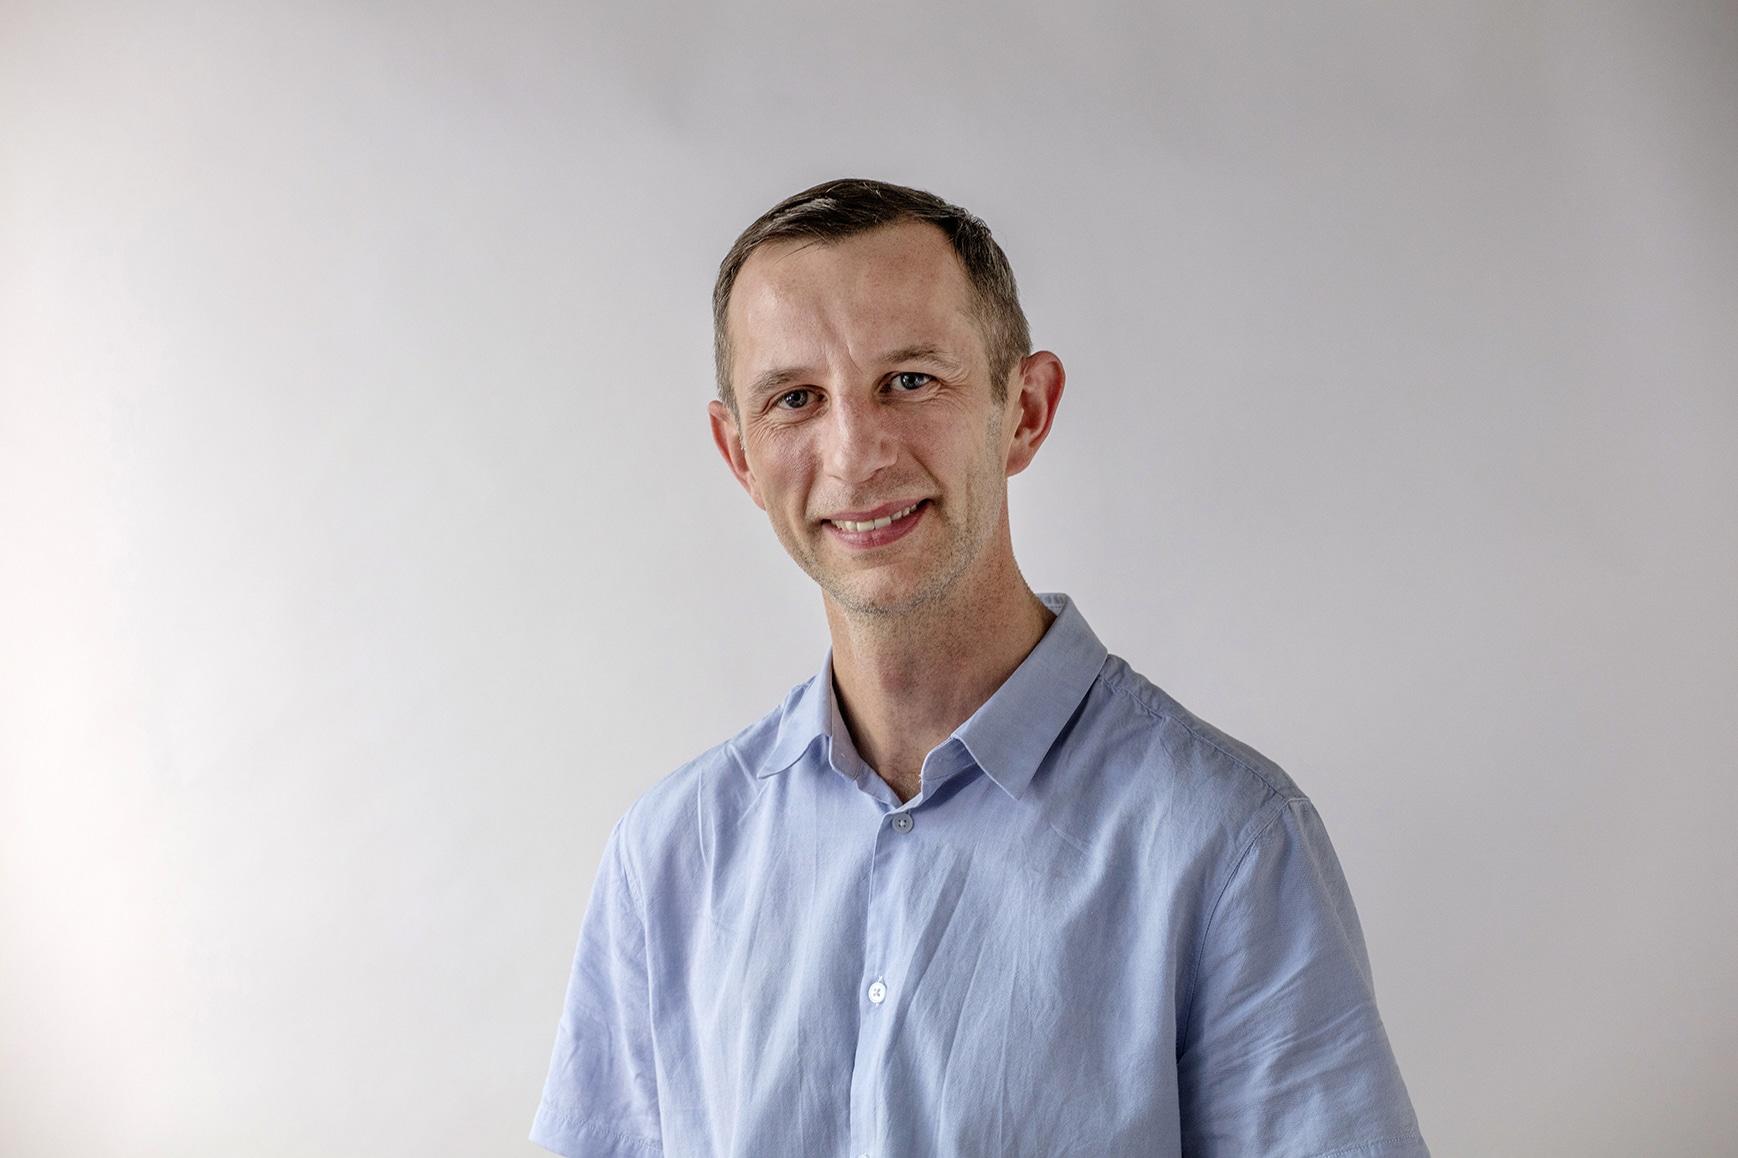 Director of Architecture - Andrew Tetlow